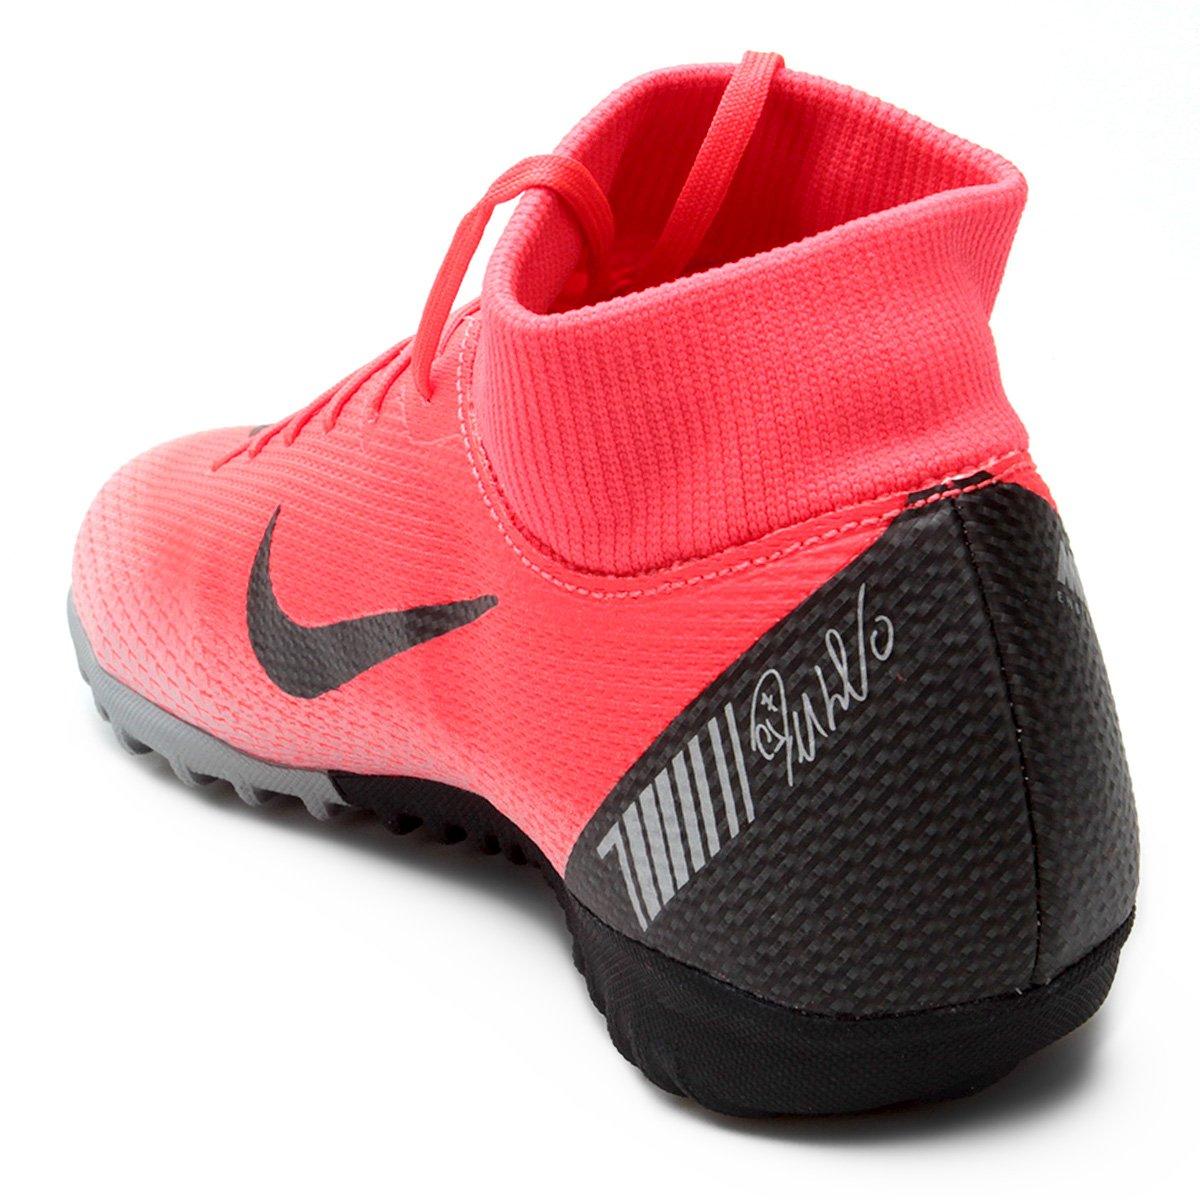 e596279b4b Chuteira Society Nike Mercurial Superfly 6 Academy CR7 TF - Preto e ...